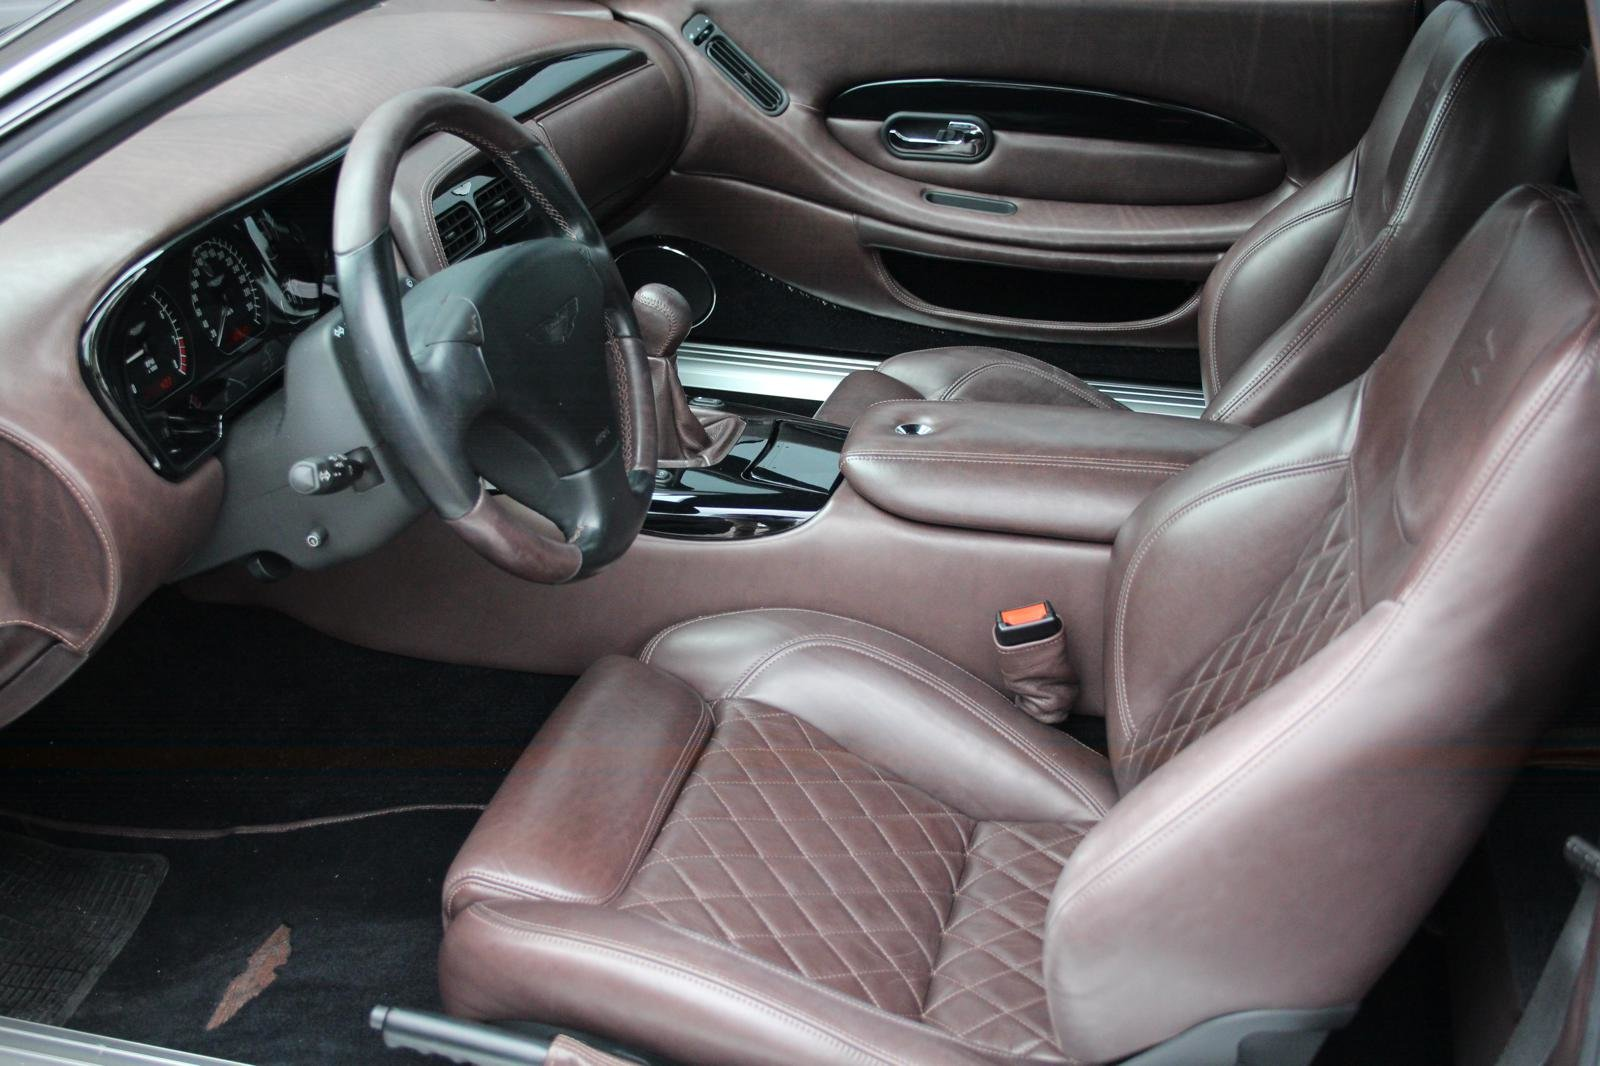 2004 Aston Martin DB 7 GT Zagato LHD  For Sale (picture 3 of 6)